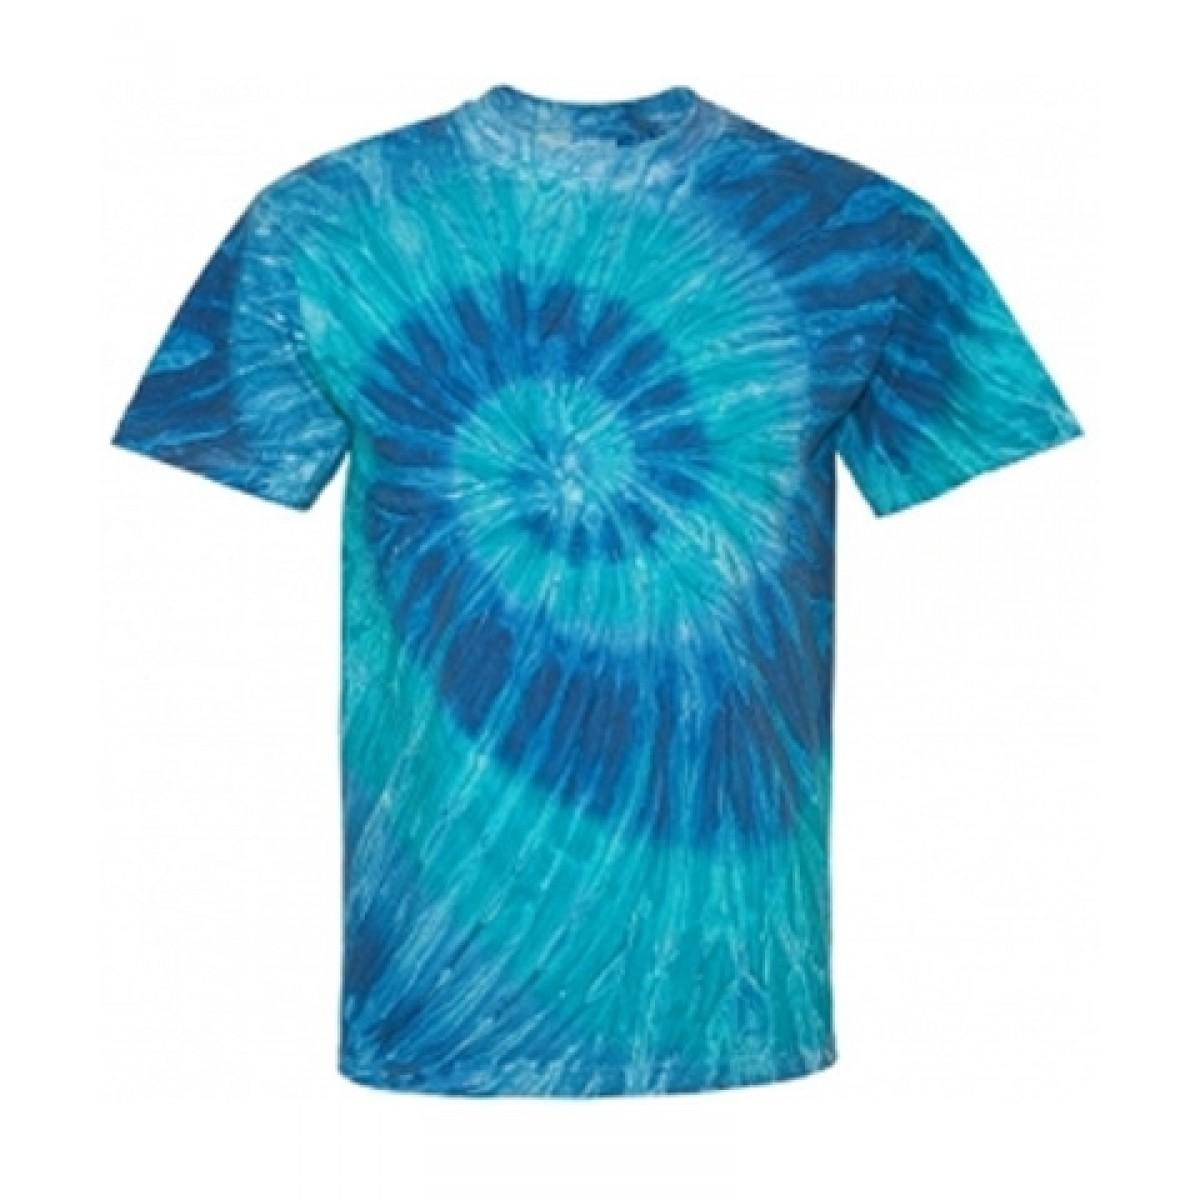 Blue or Black Ripple Tie Dye T-Shirt-Scuba Blue -L